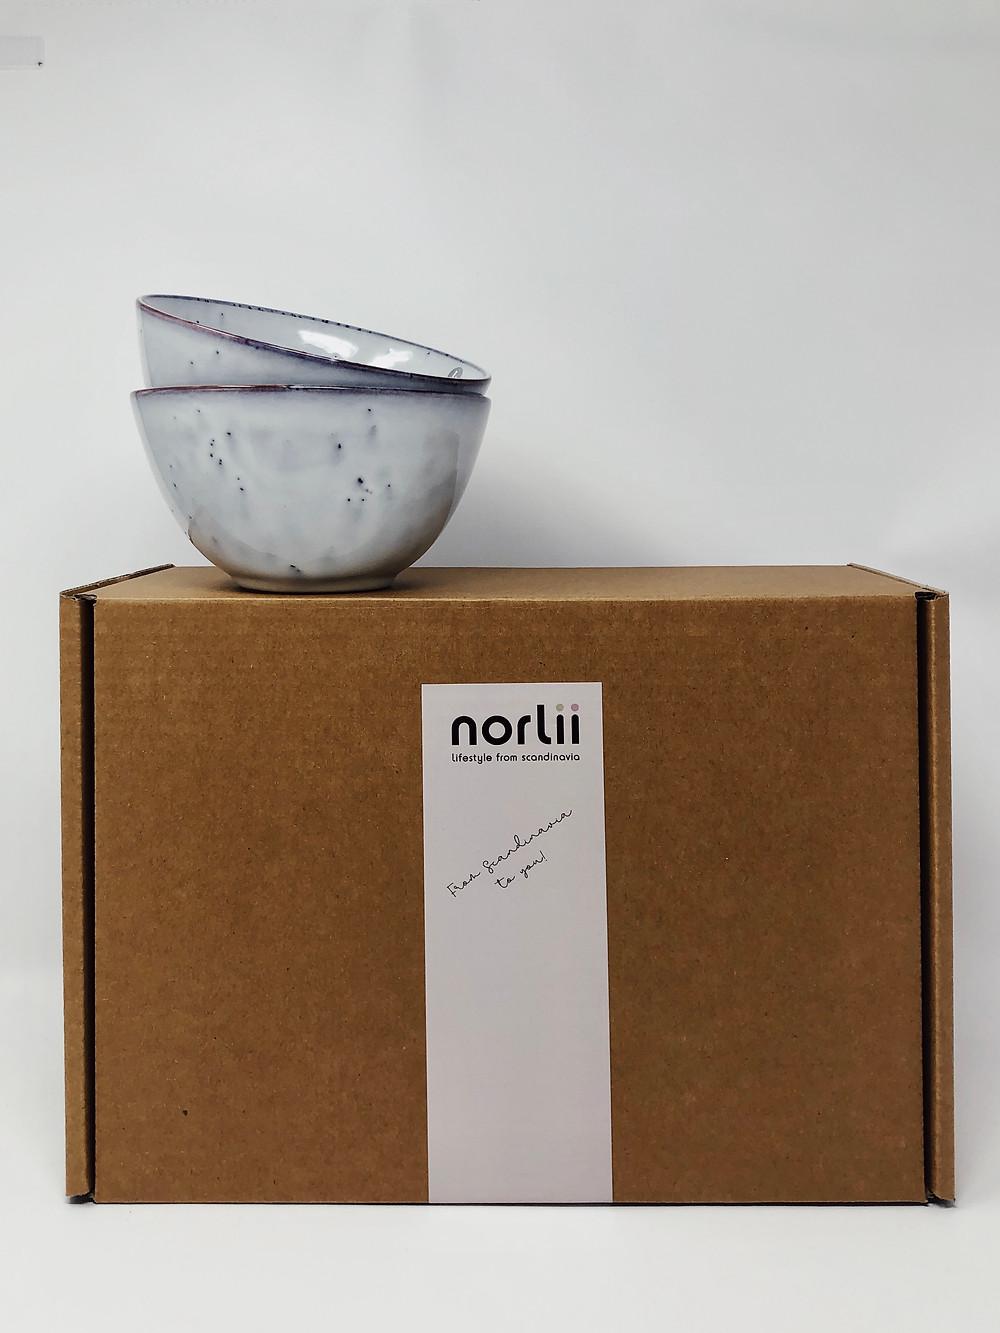 Nordic Sand bowls from Broste Copenhagen